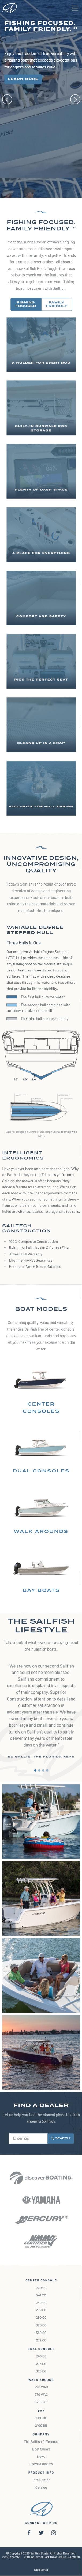 custom website design for Sailfish Boats mobile